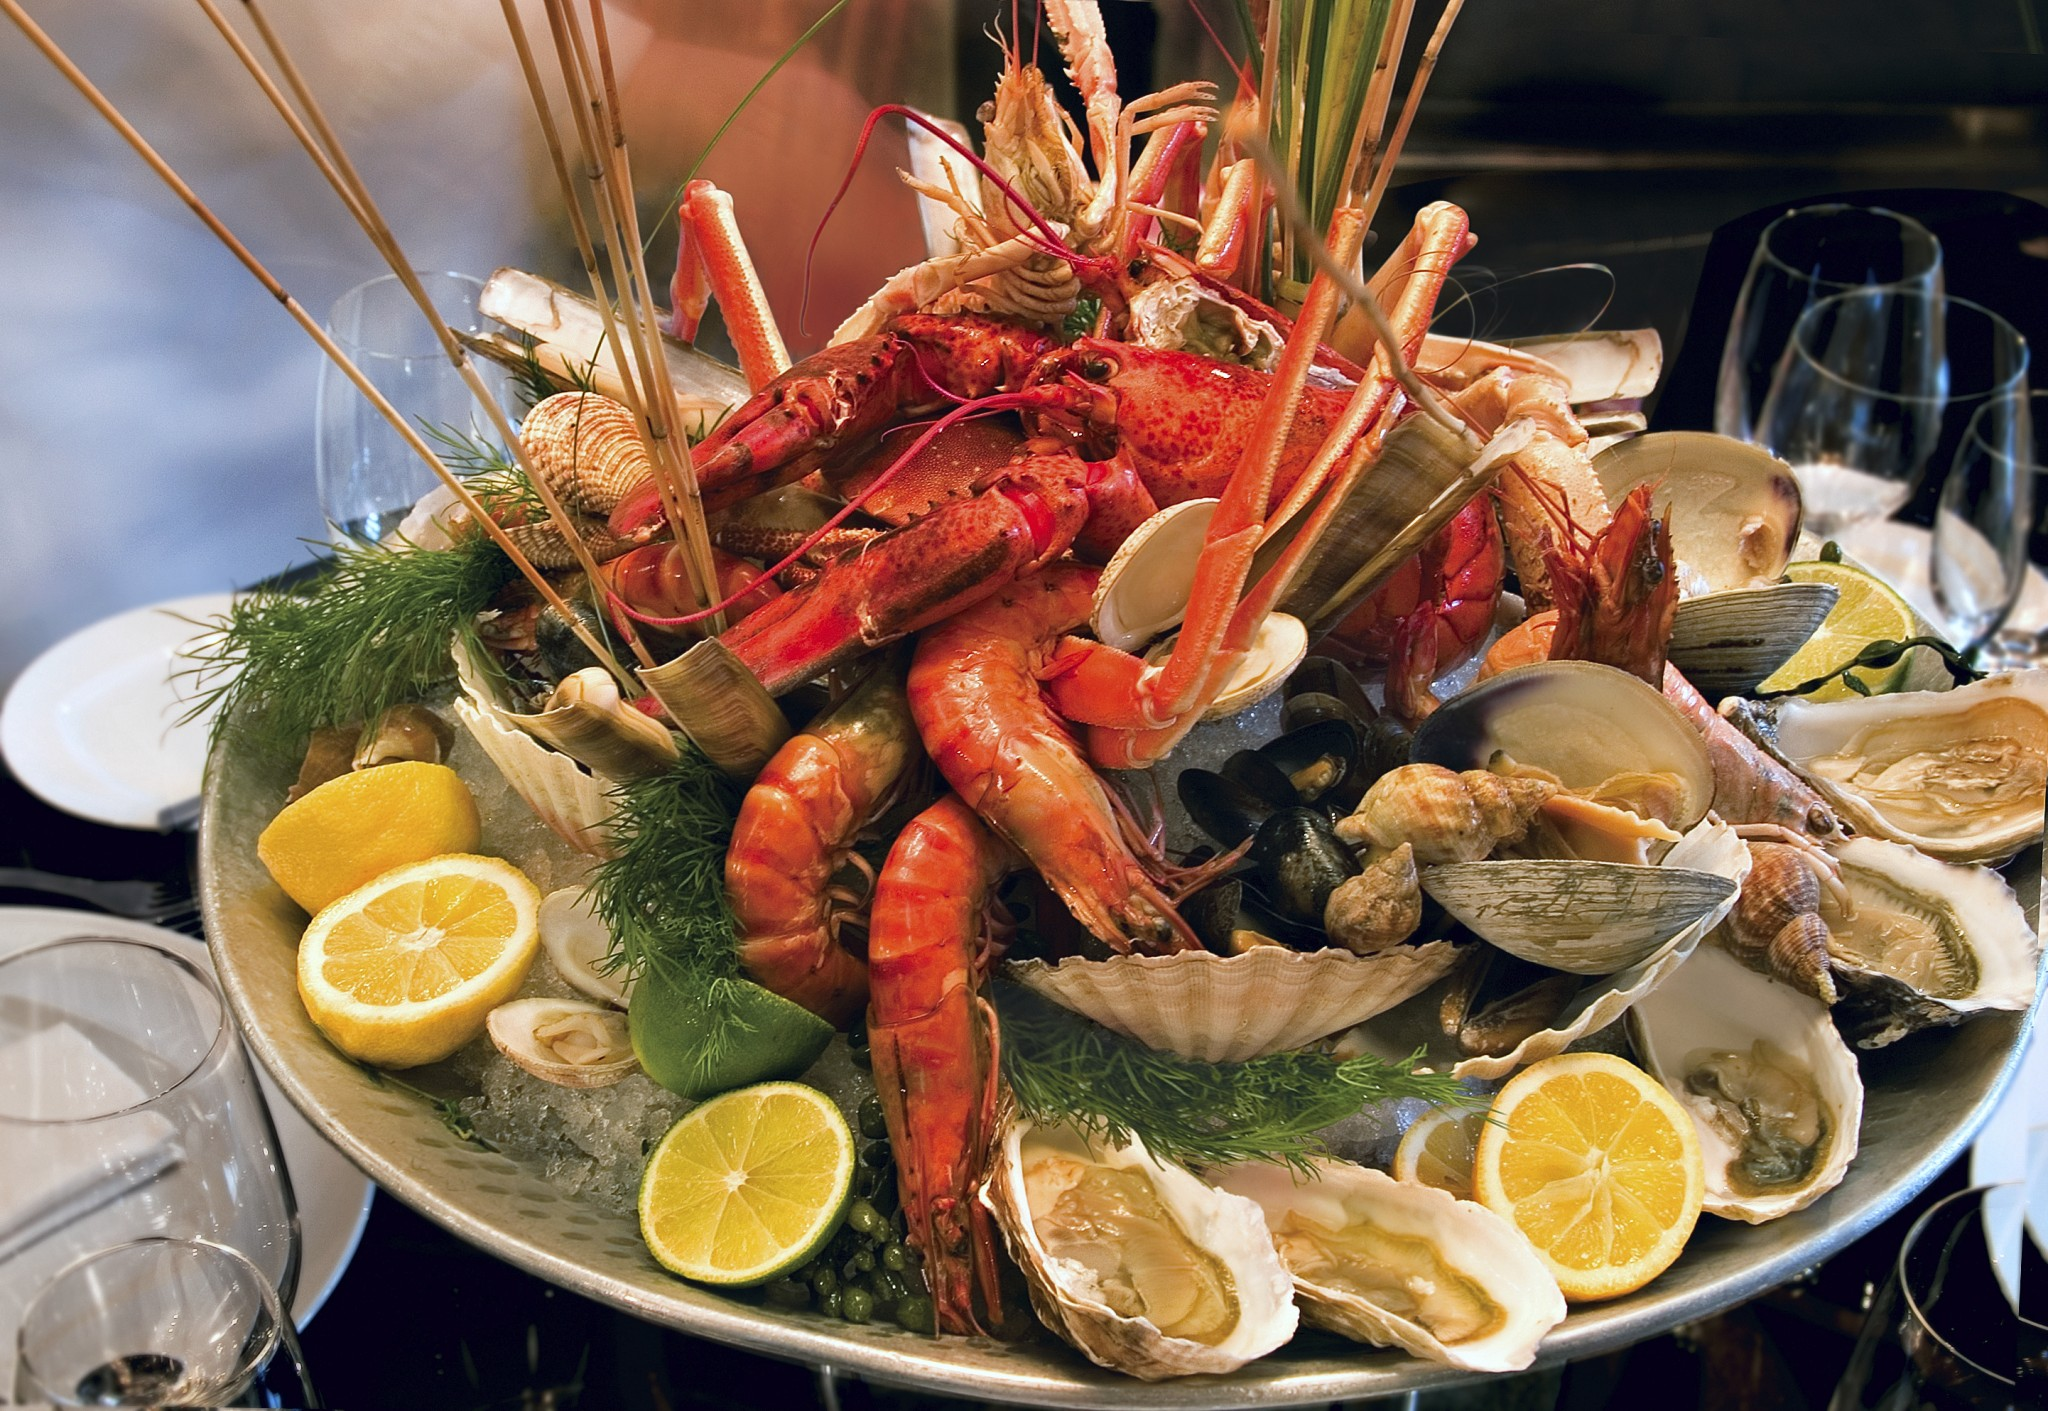 istock_000004750933large-seafood-platter-2048x1411